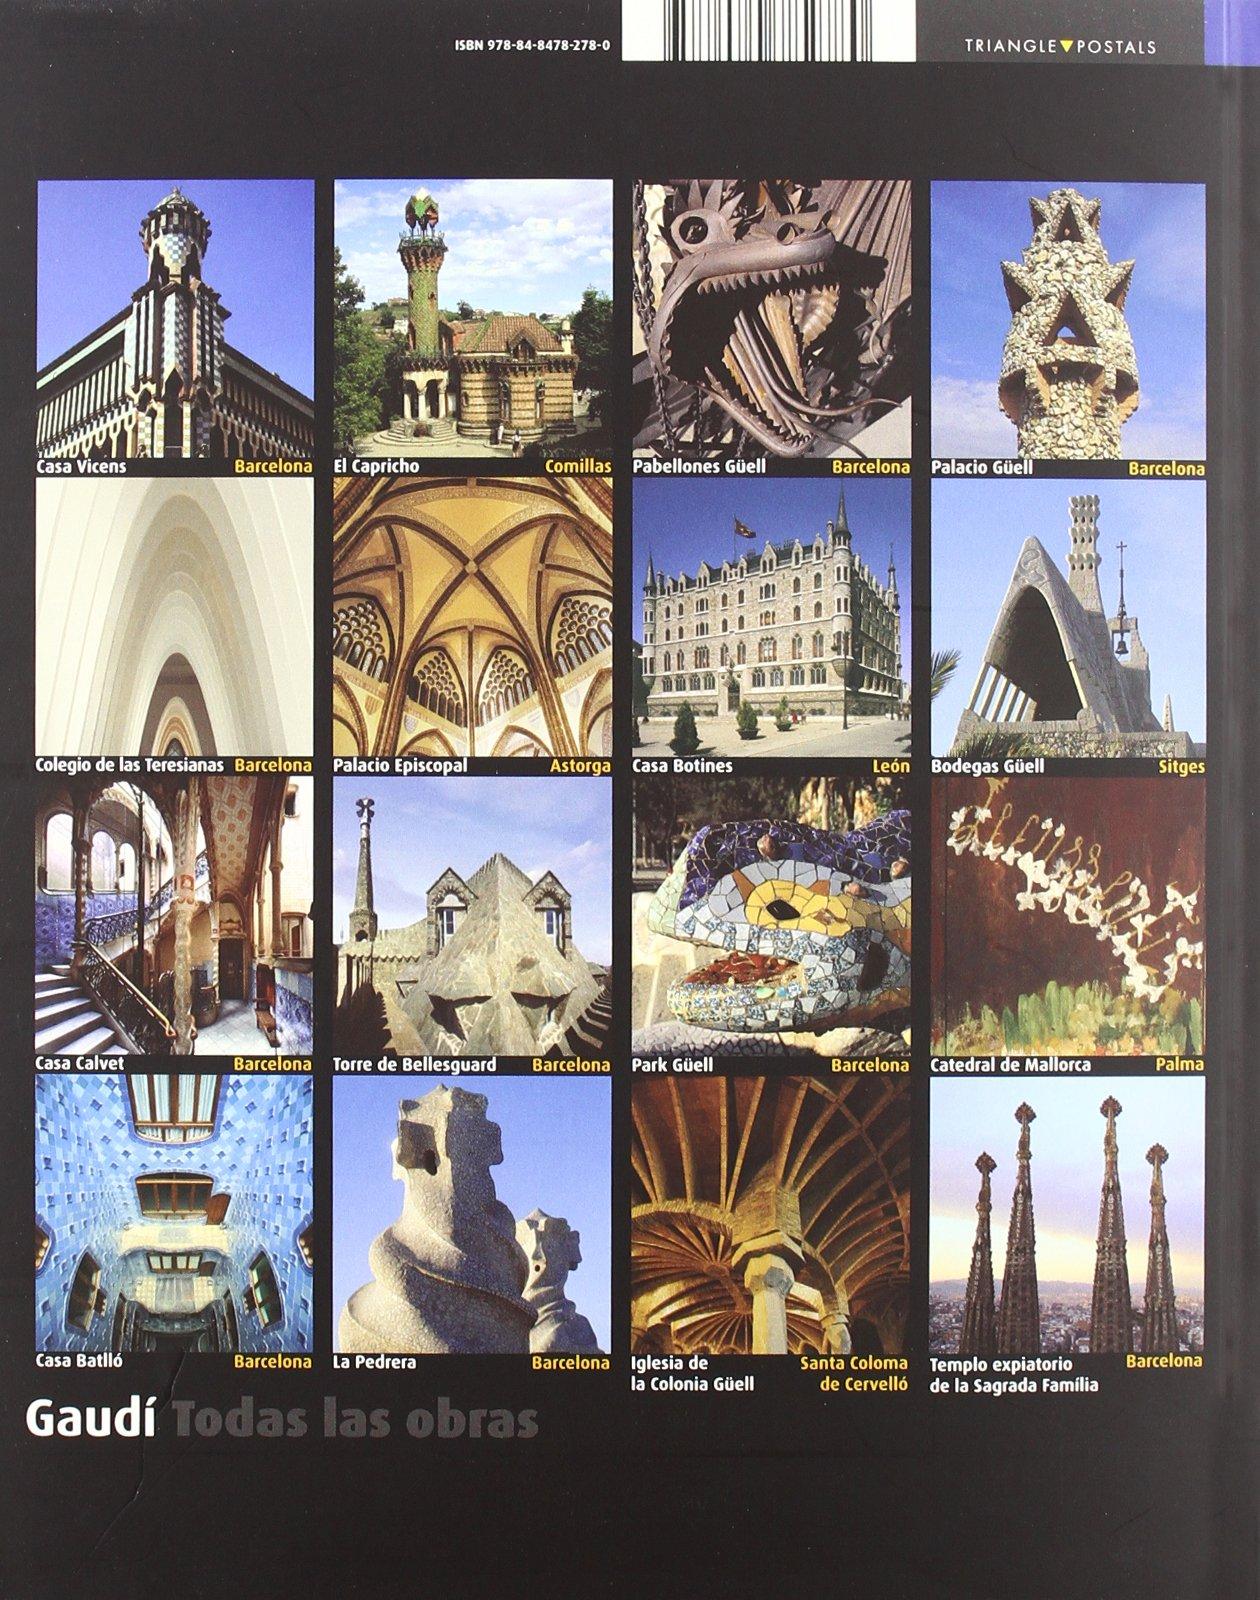 Gaudí : Todas las obras: Joan Bassegoda i Nonell, Pere Vivas, Ricardo Pla: 9788484782780: Amazon.com: Books